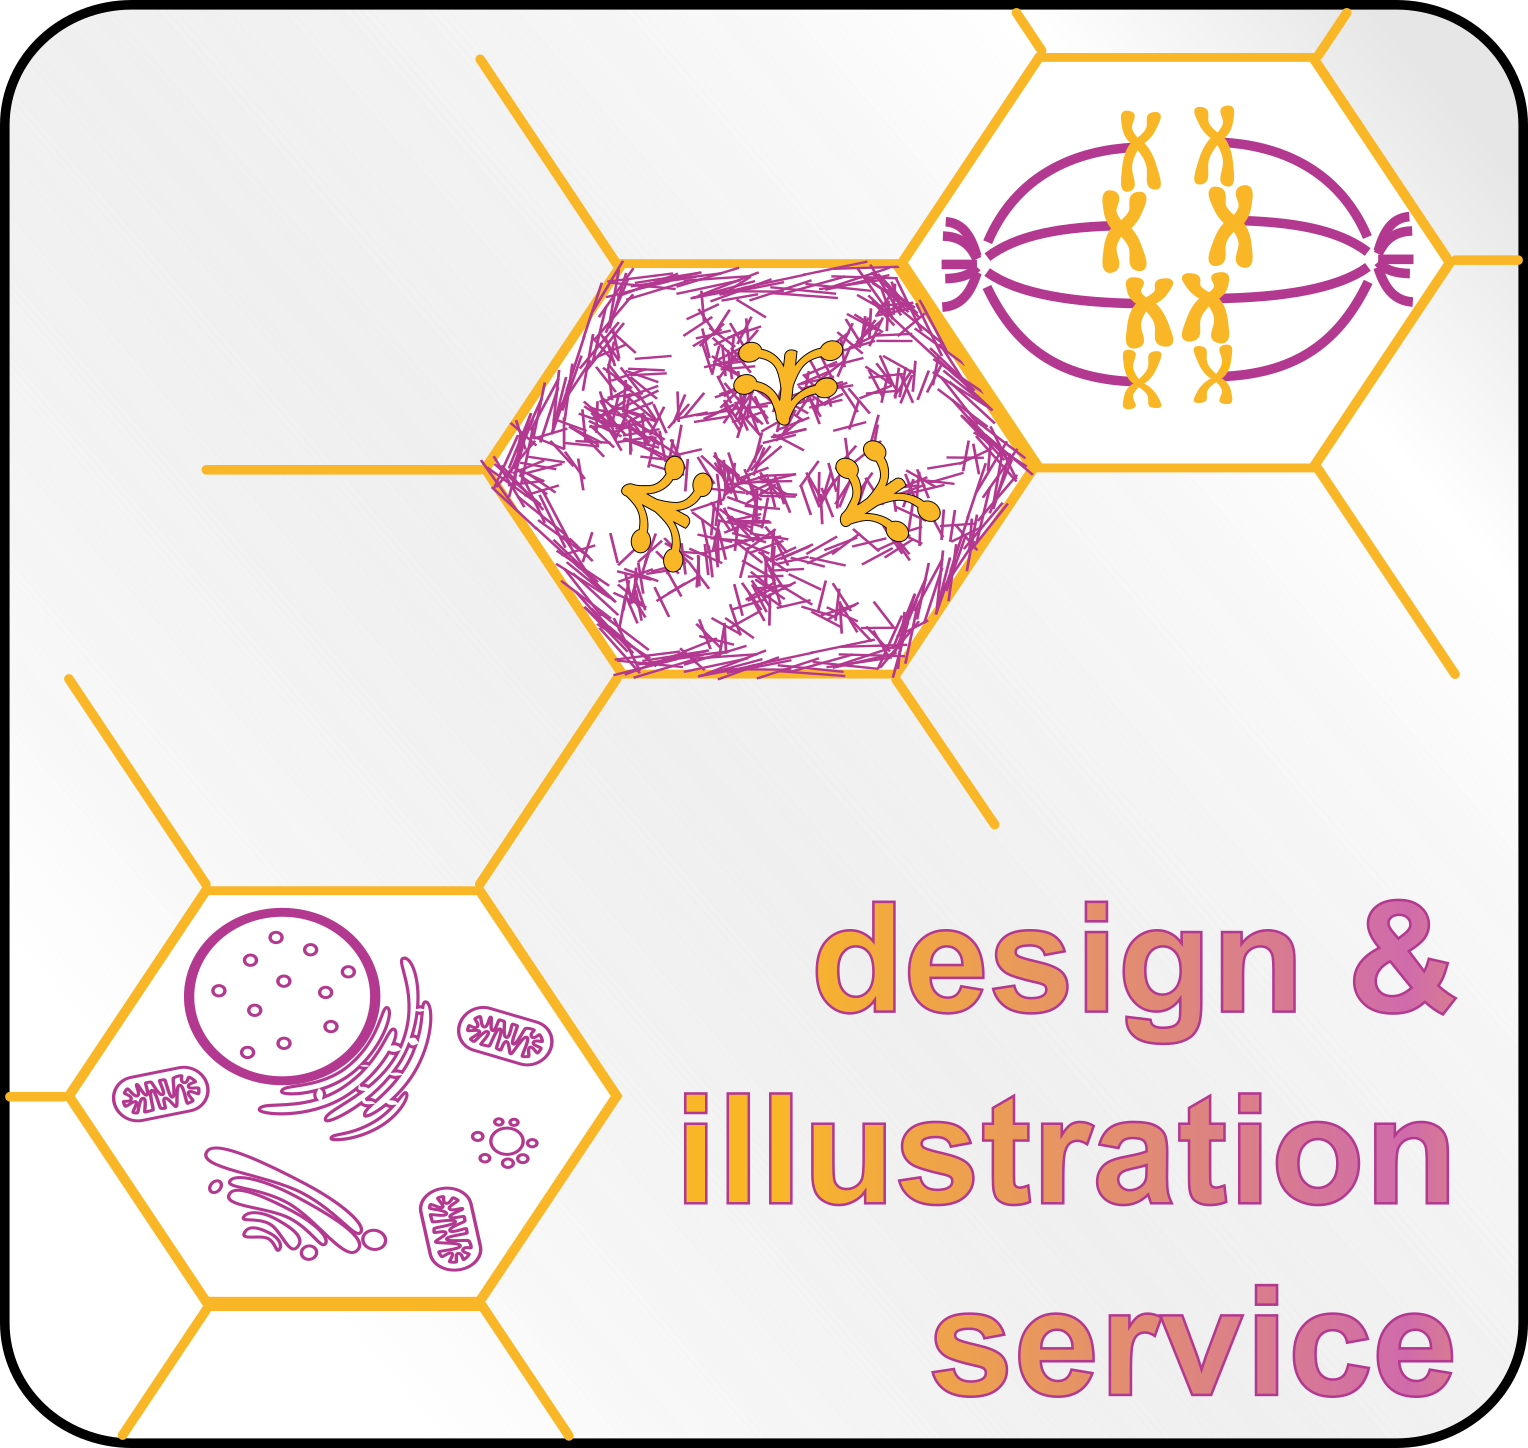 Design and Illustration Service